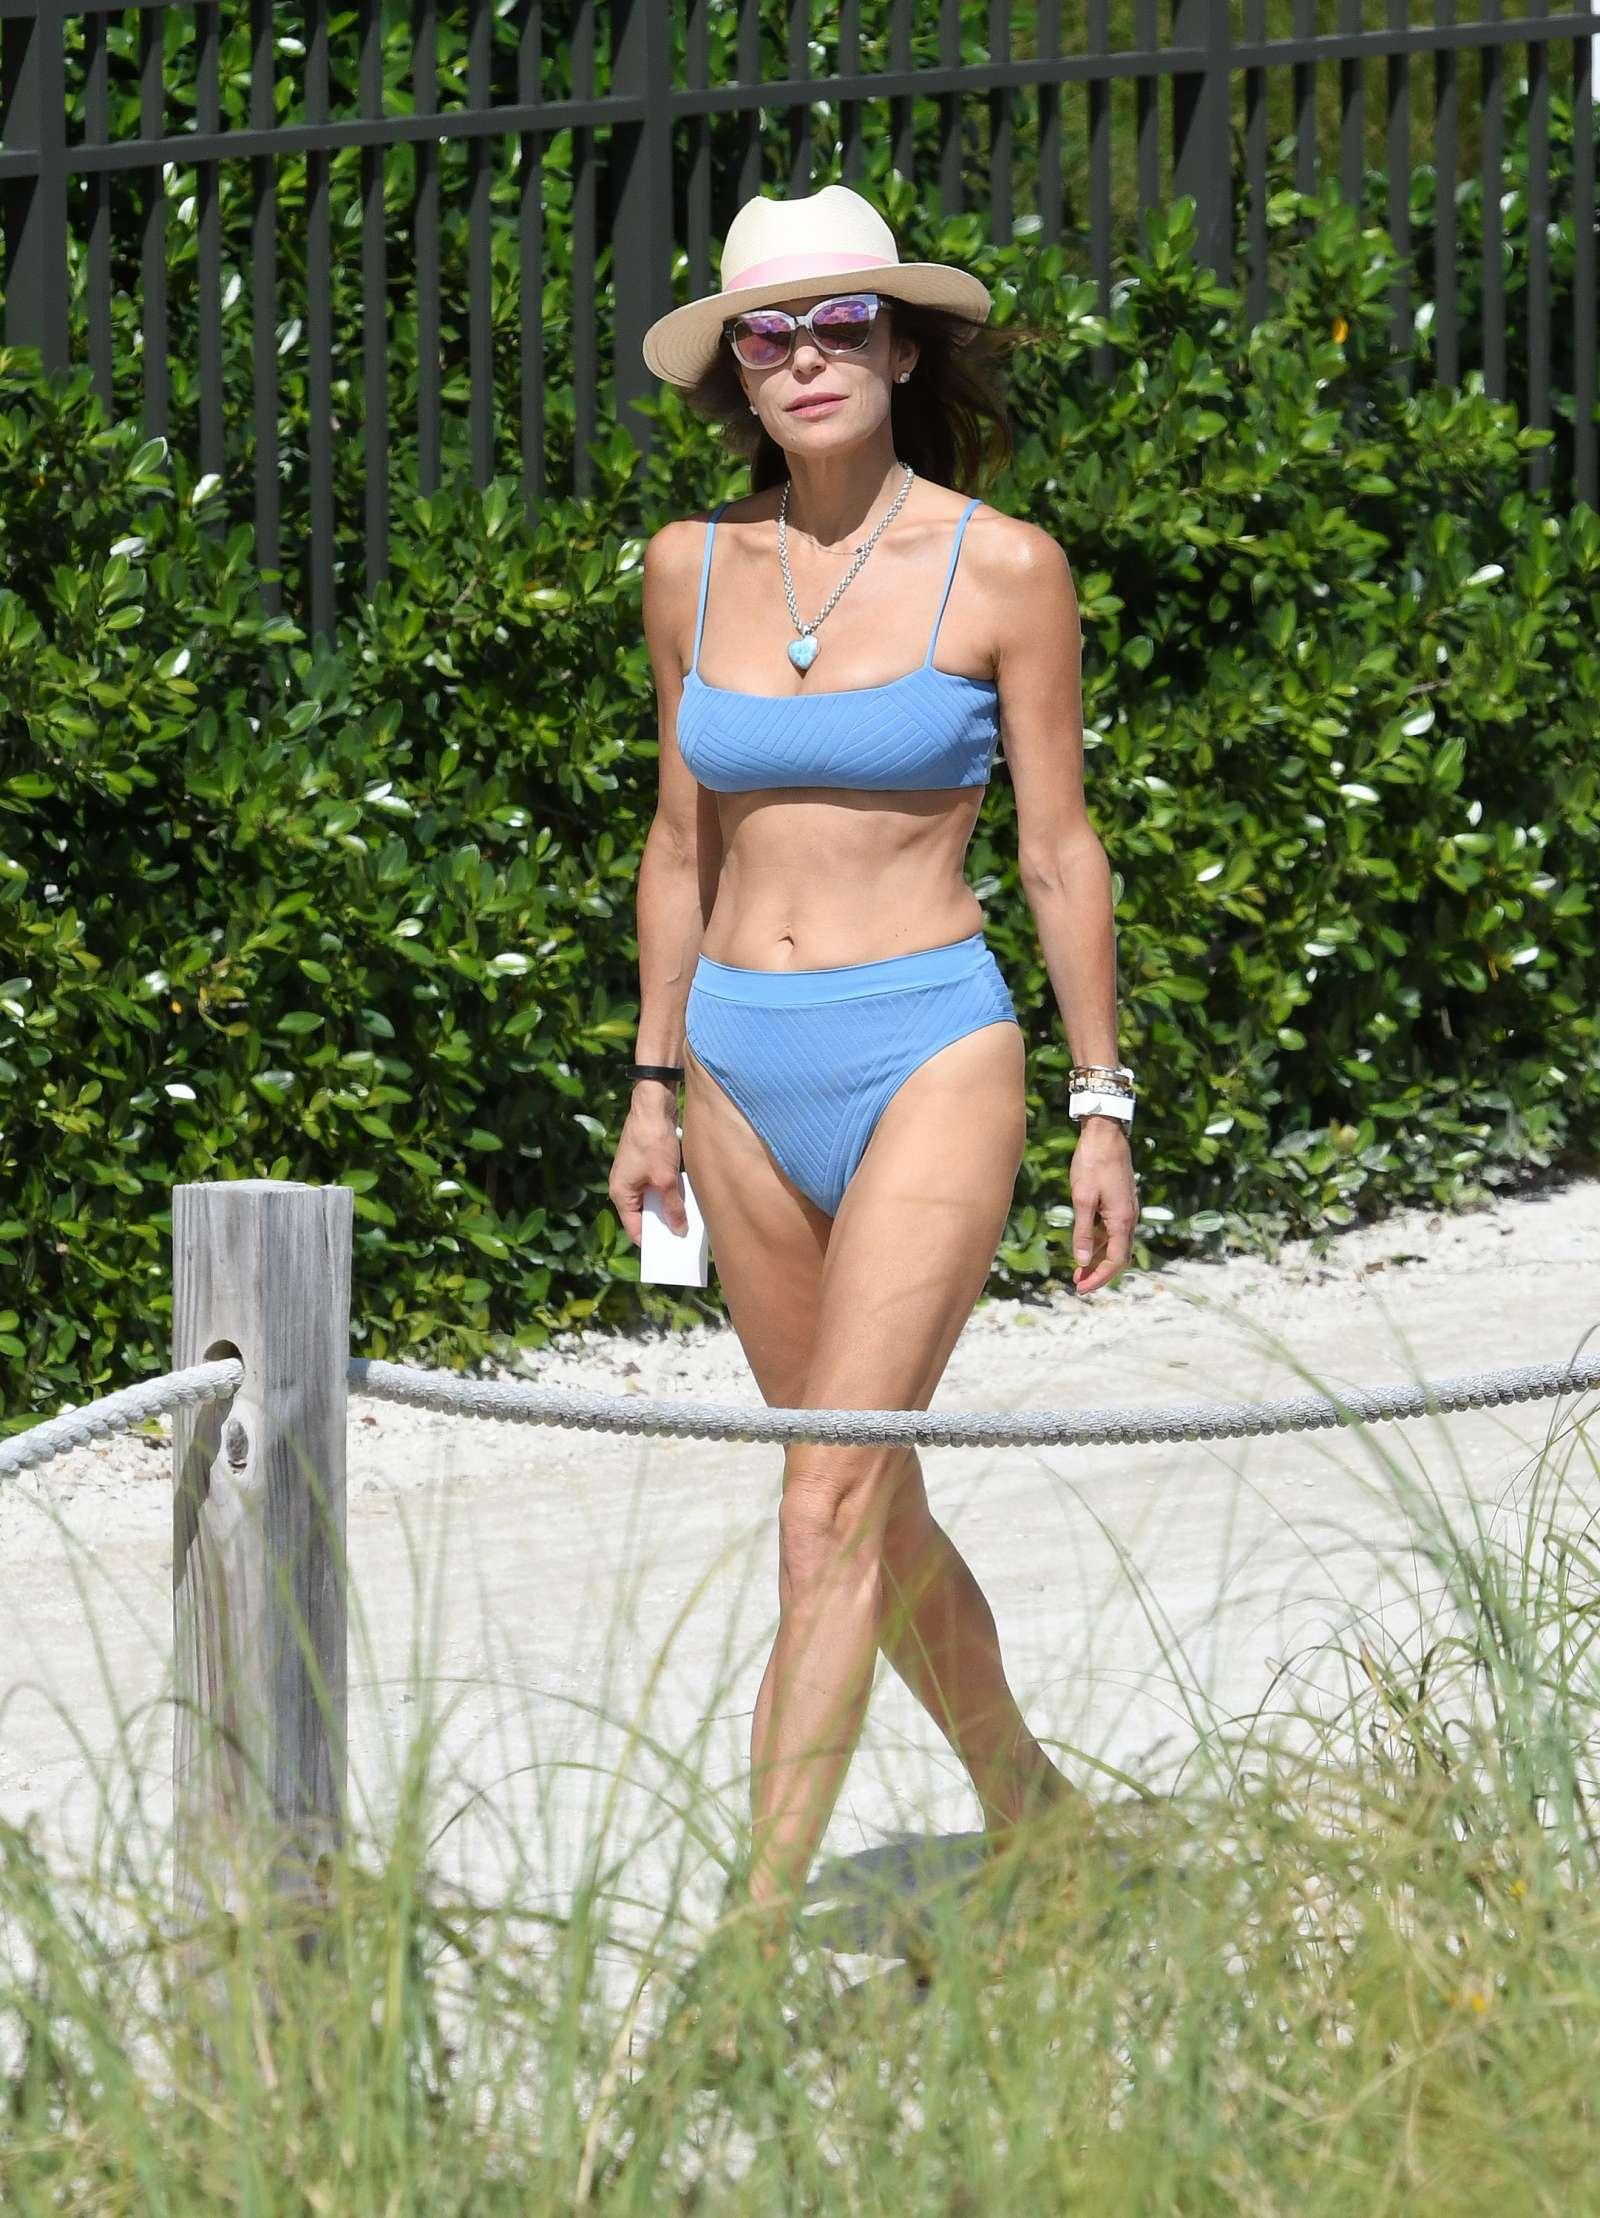 Bethenny Frankel 2019 : Bethenny Frankel in Blue Bikini 2019 -01